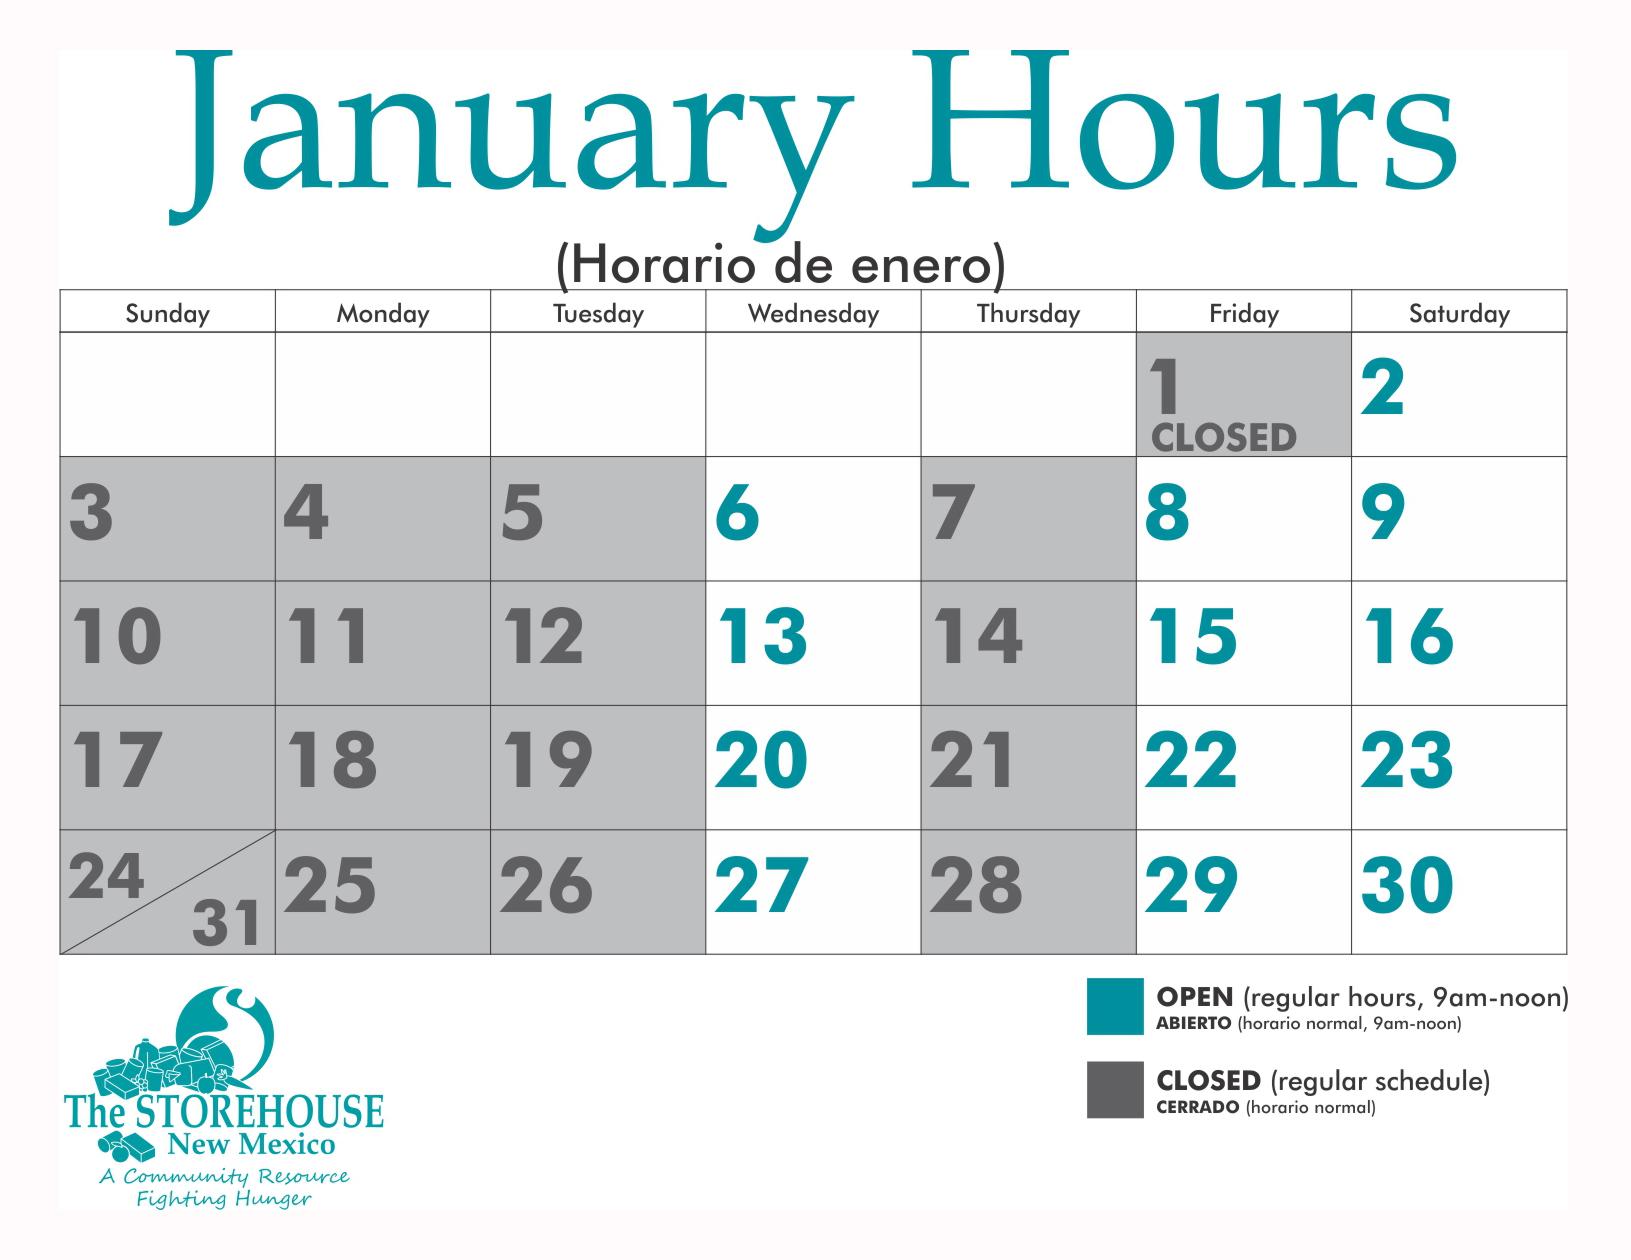 January-Hours-Storehouse